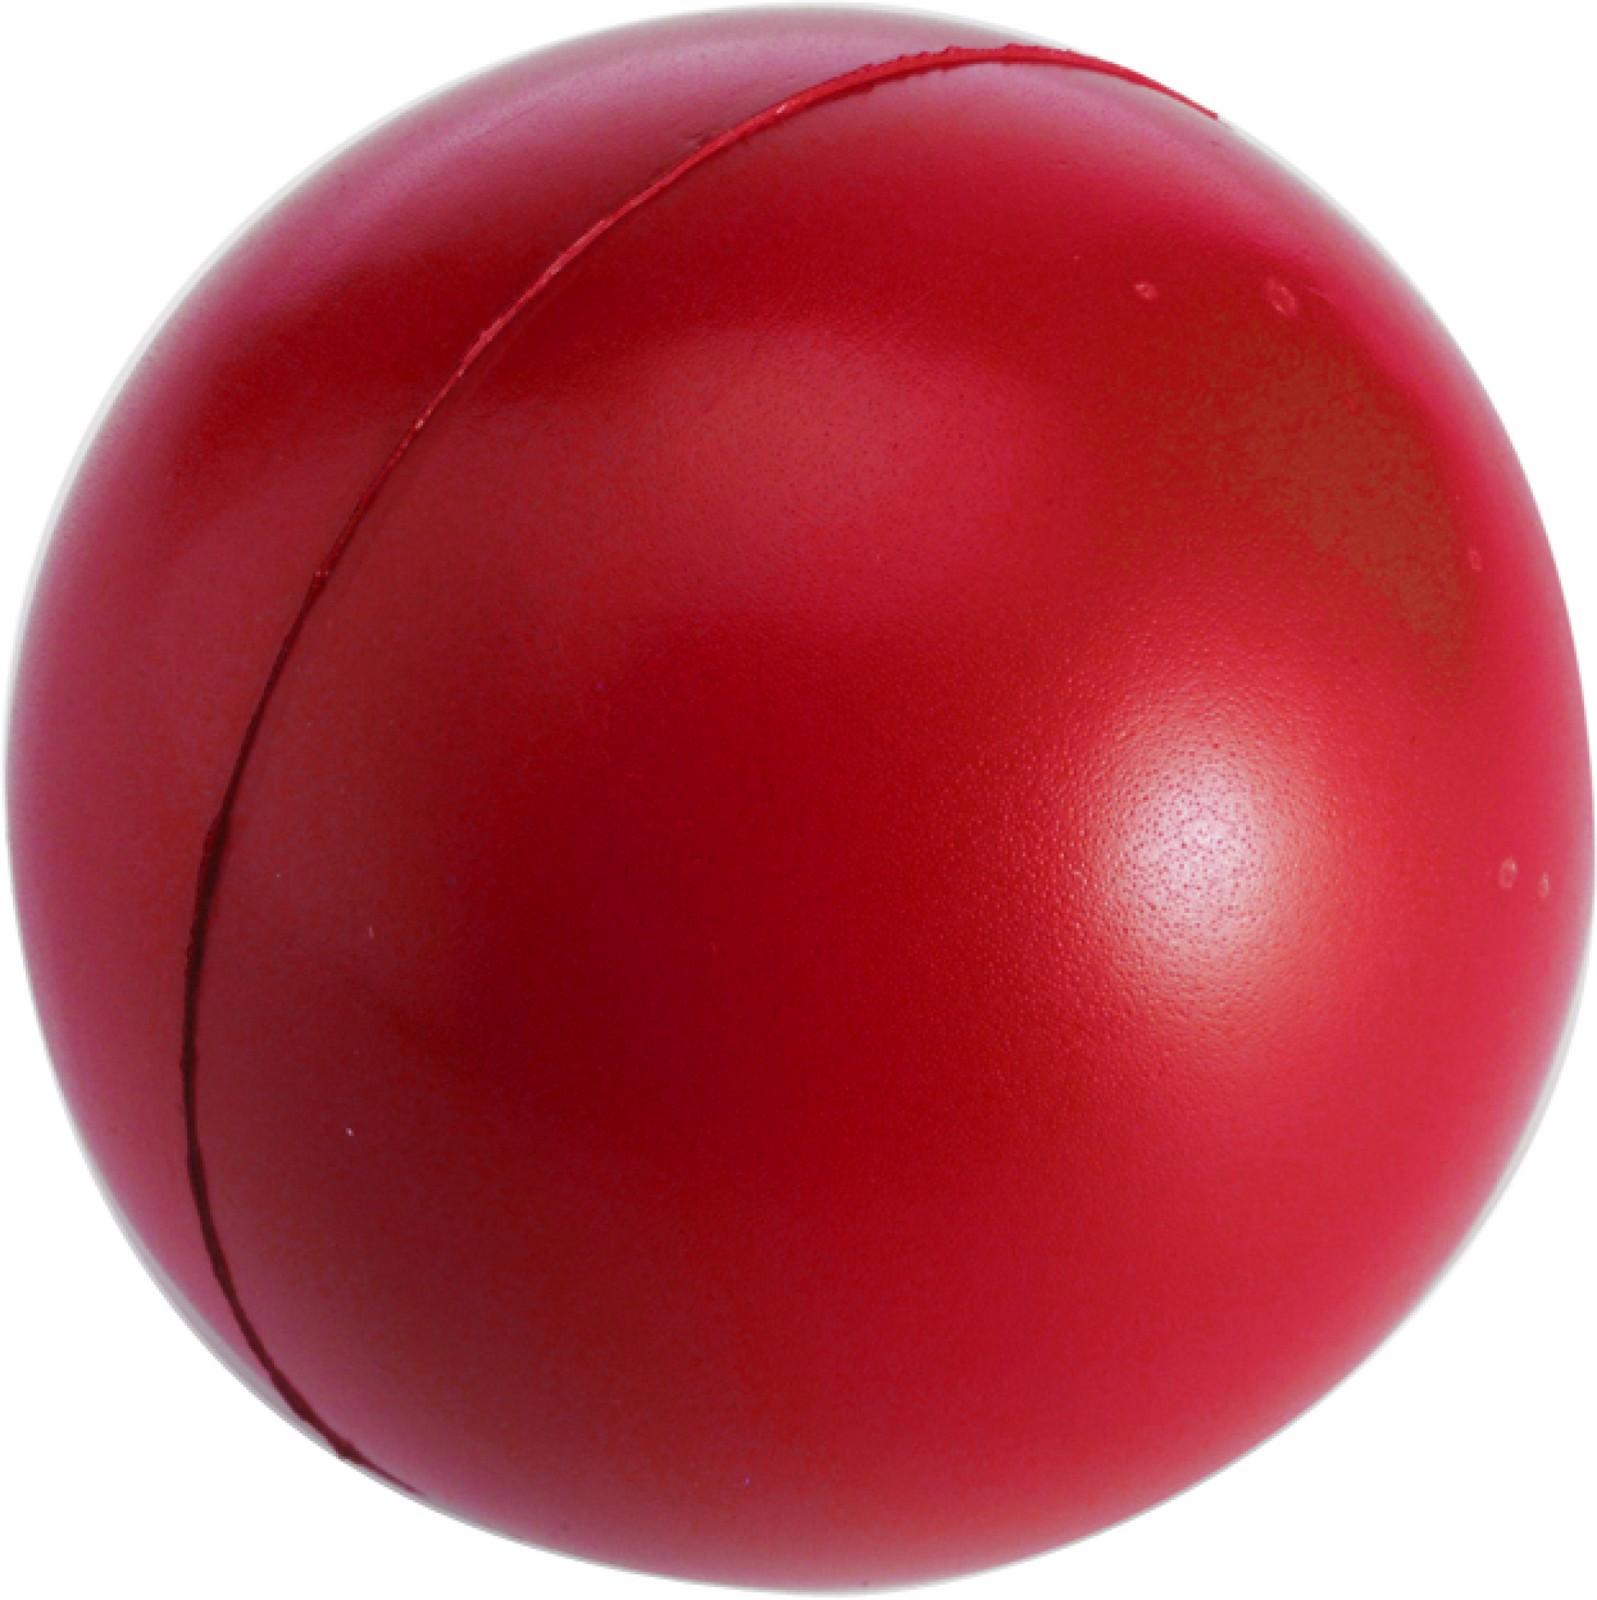 PU foam stress ball - Red